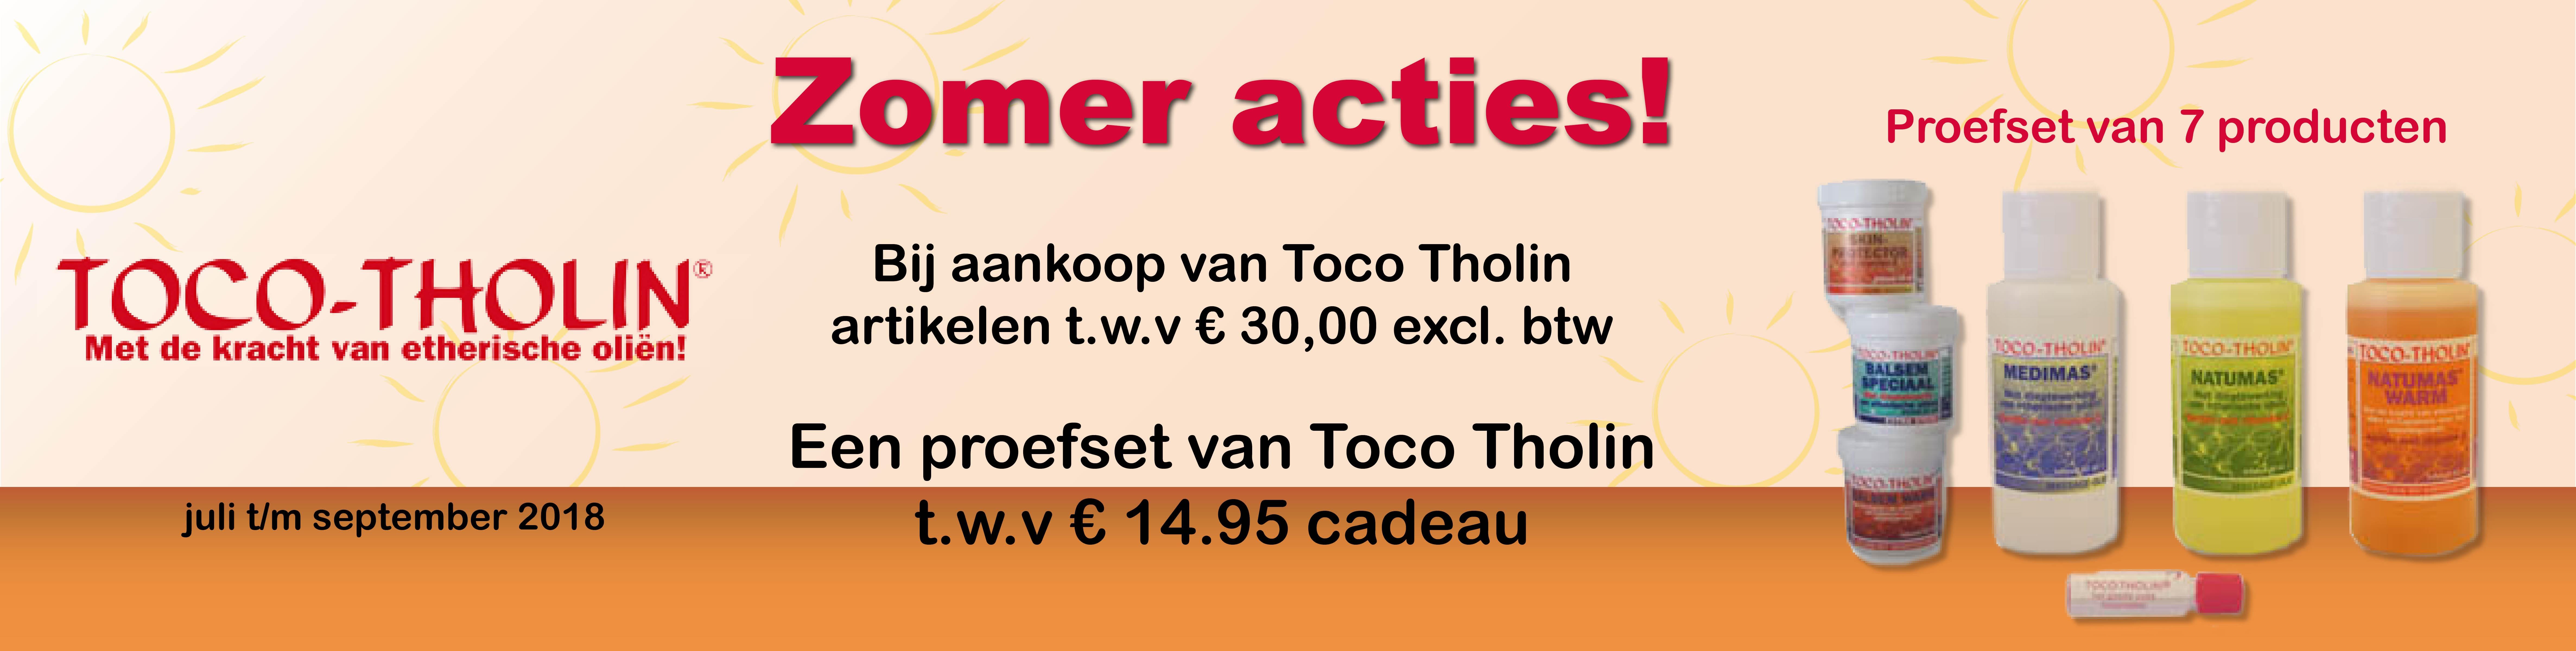 Toco Tholin zomeractie